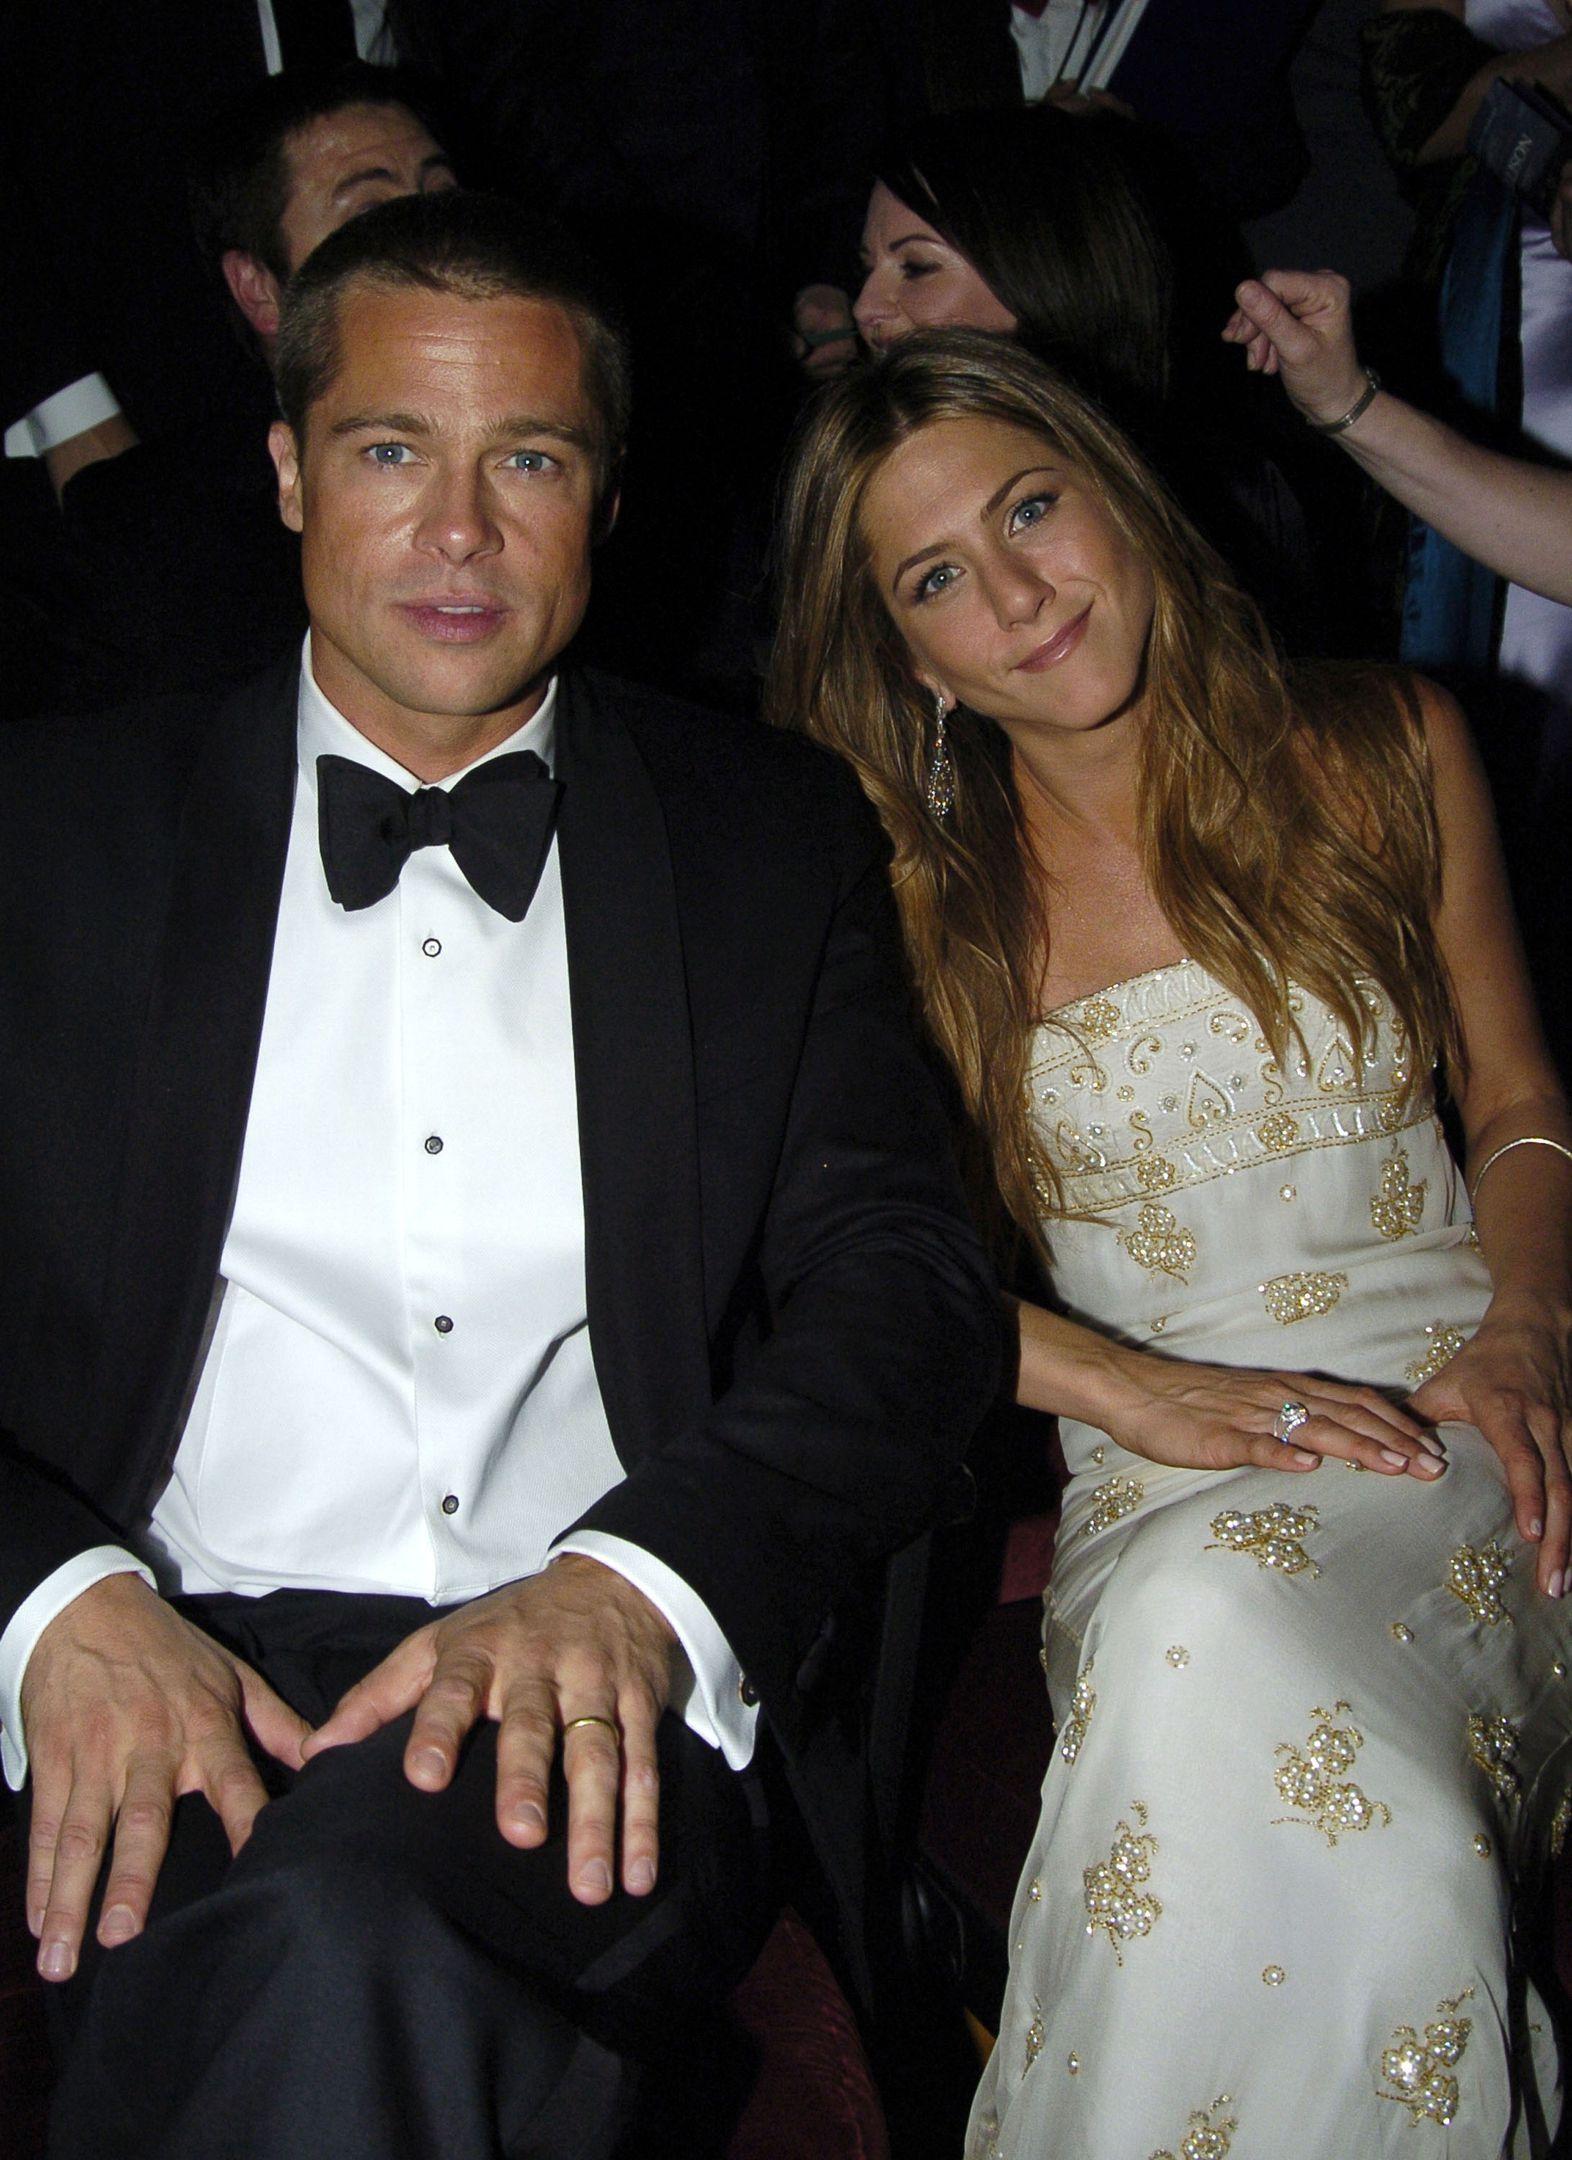 An In Depth Analysis Of Jennifer Aniston S Body Language With Justin Theroux Versus Brad Pitt Brad Pitt Jennifer Aniston Brad Pitt And Jennifer Brad And Jen